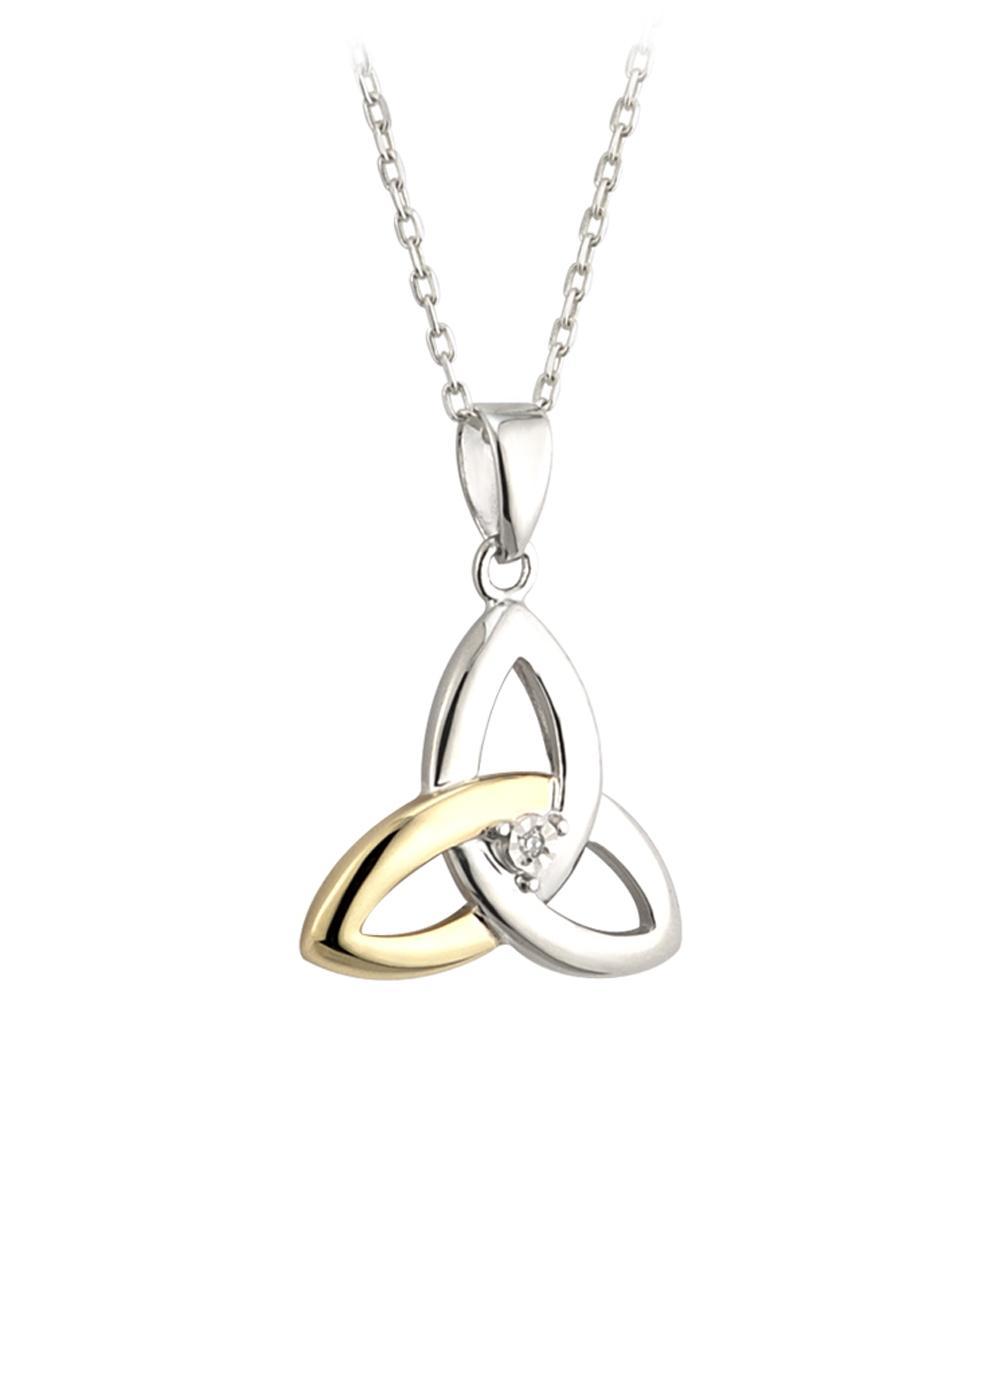 10K Gold & Sterling Silver Diamond Trinity Knot Pendant